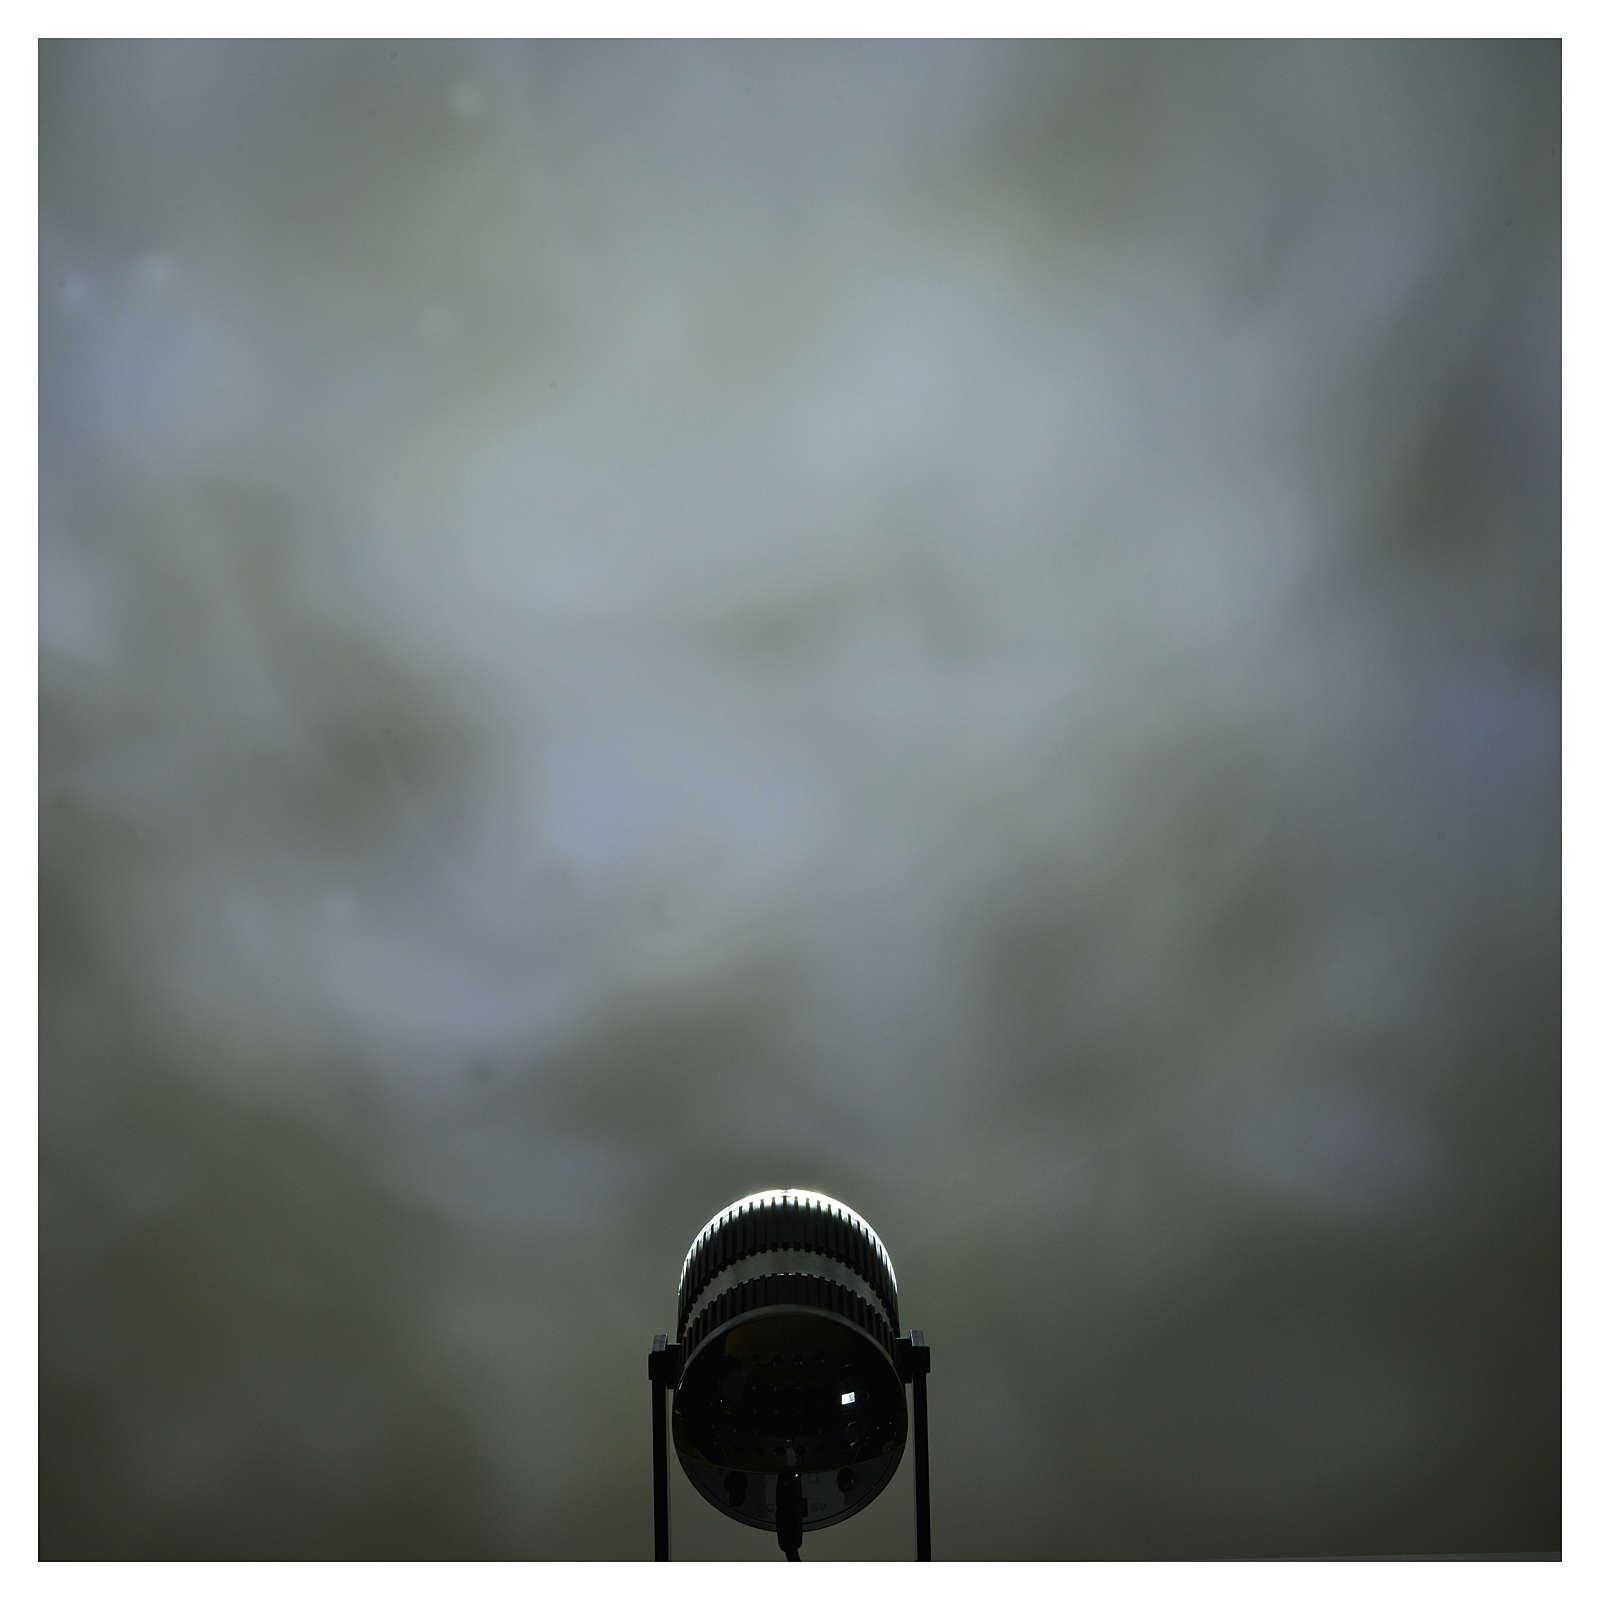 Cloud projector 4